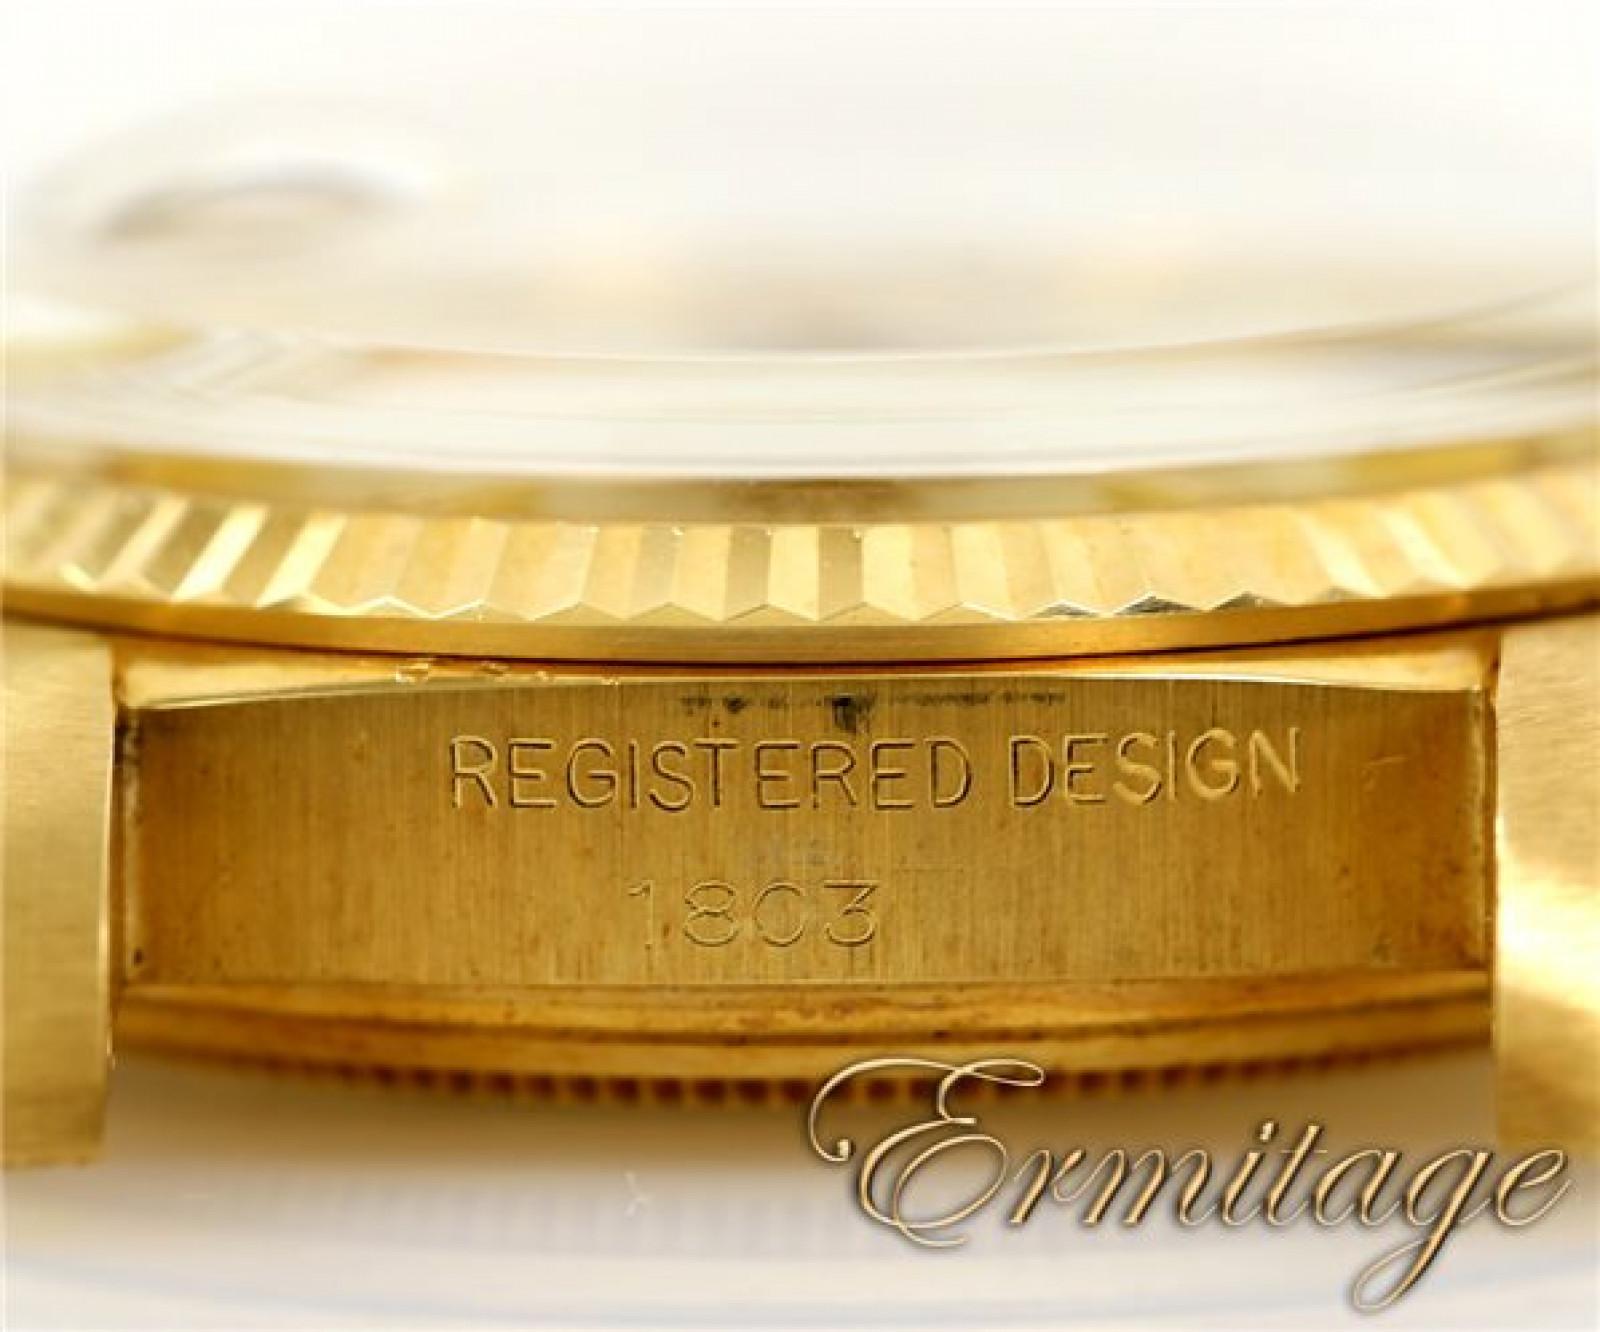 Vintage Rolex Day-Date 1803 Gold Year 1973 1973